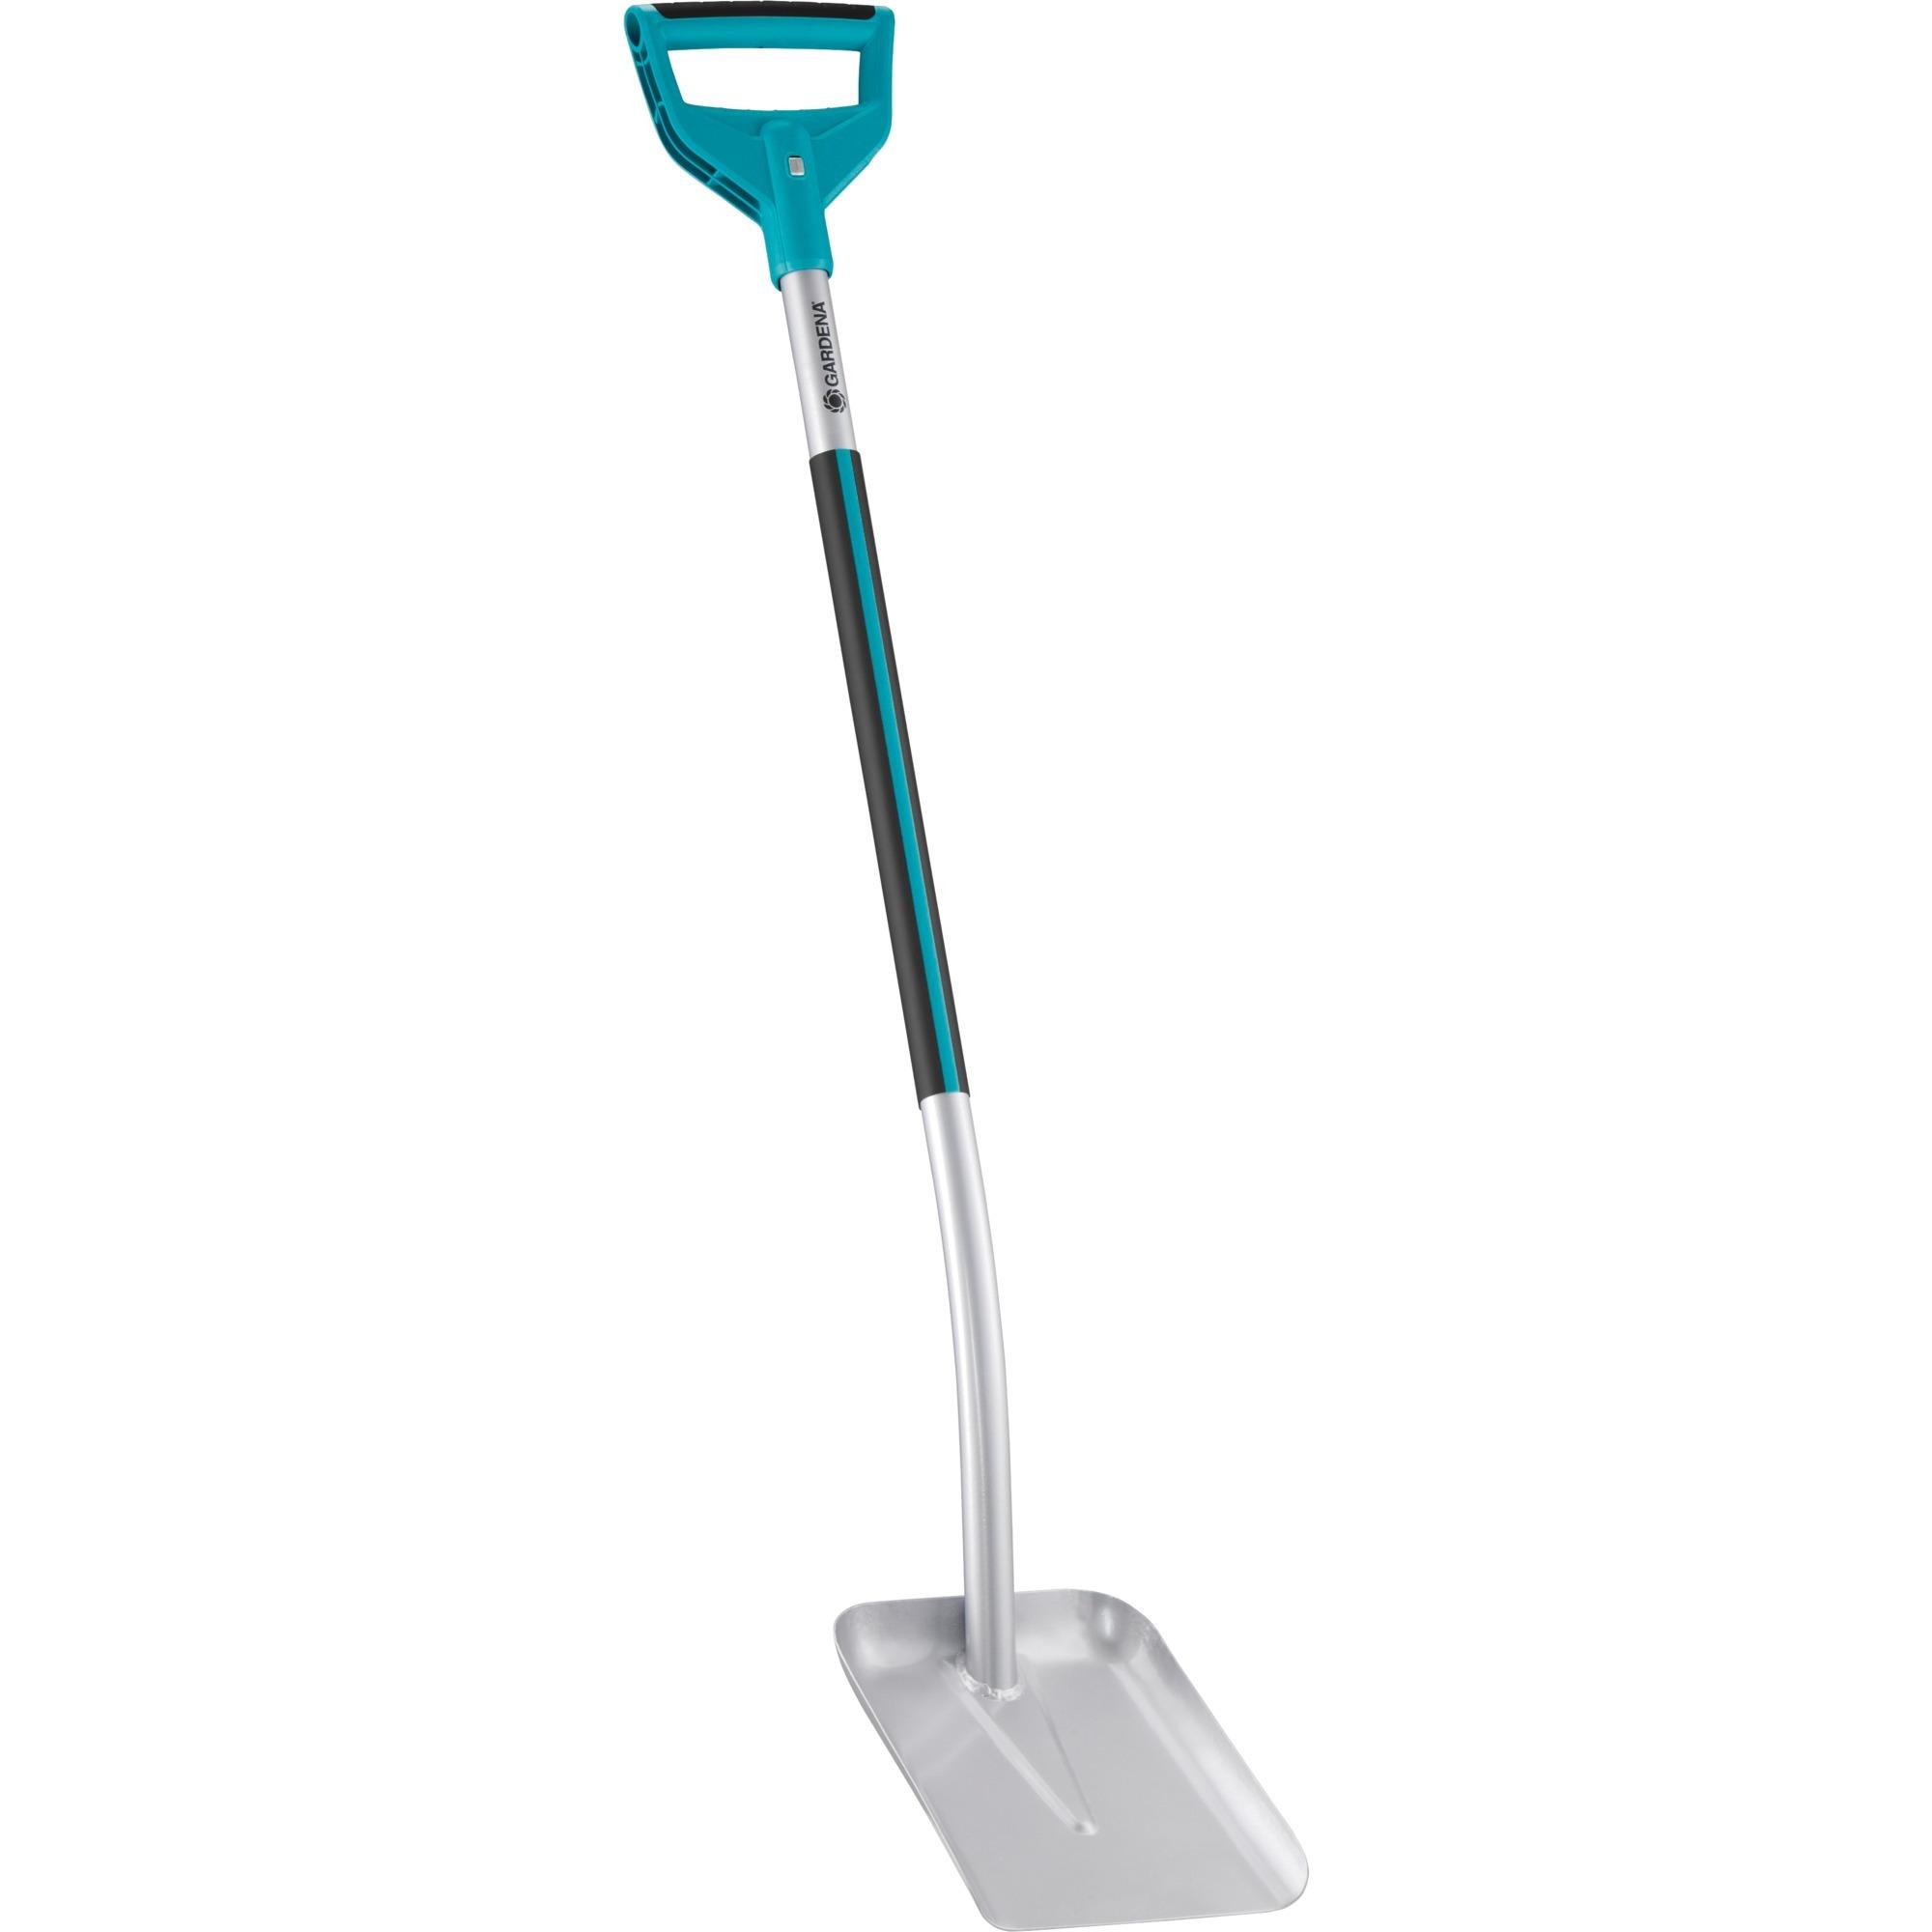 3786-20-metal-sort-blaa-solv-shoveltrowel-skovl